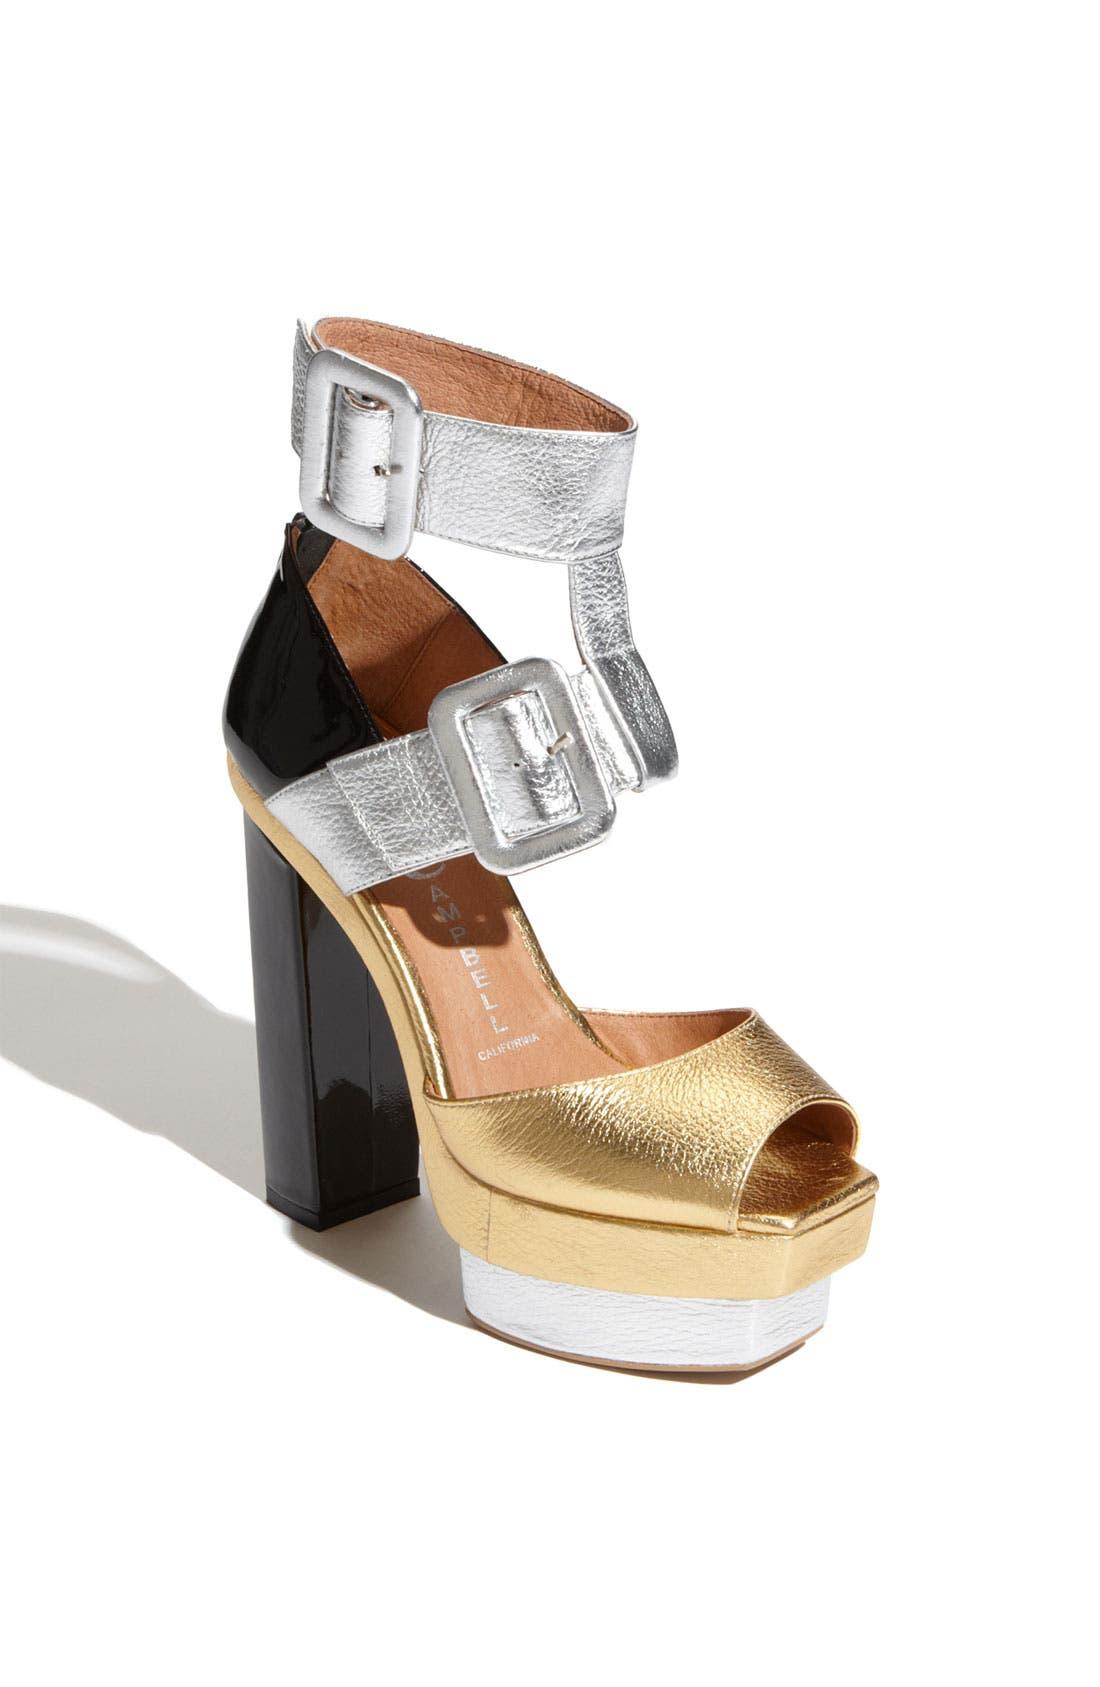 Alternate Image 1 Selected - Jeffrey Campbell 'Dressen' Sandal